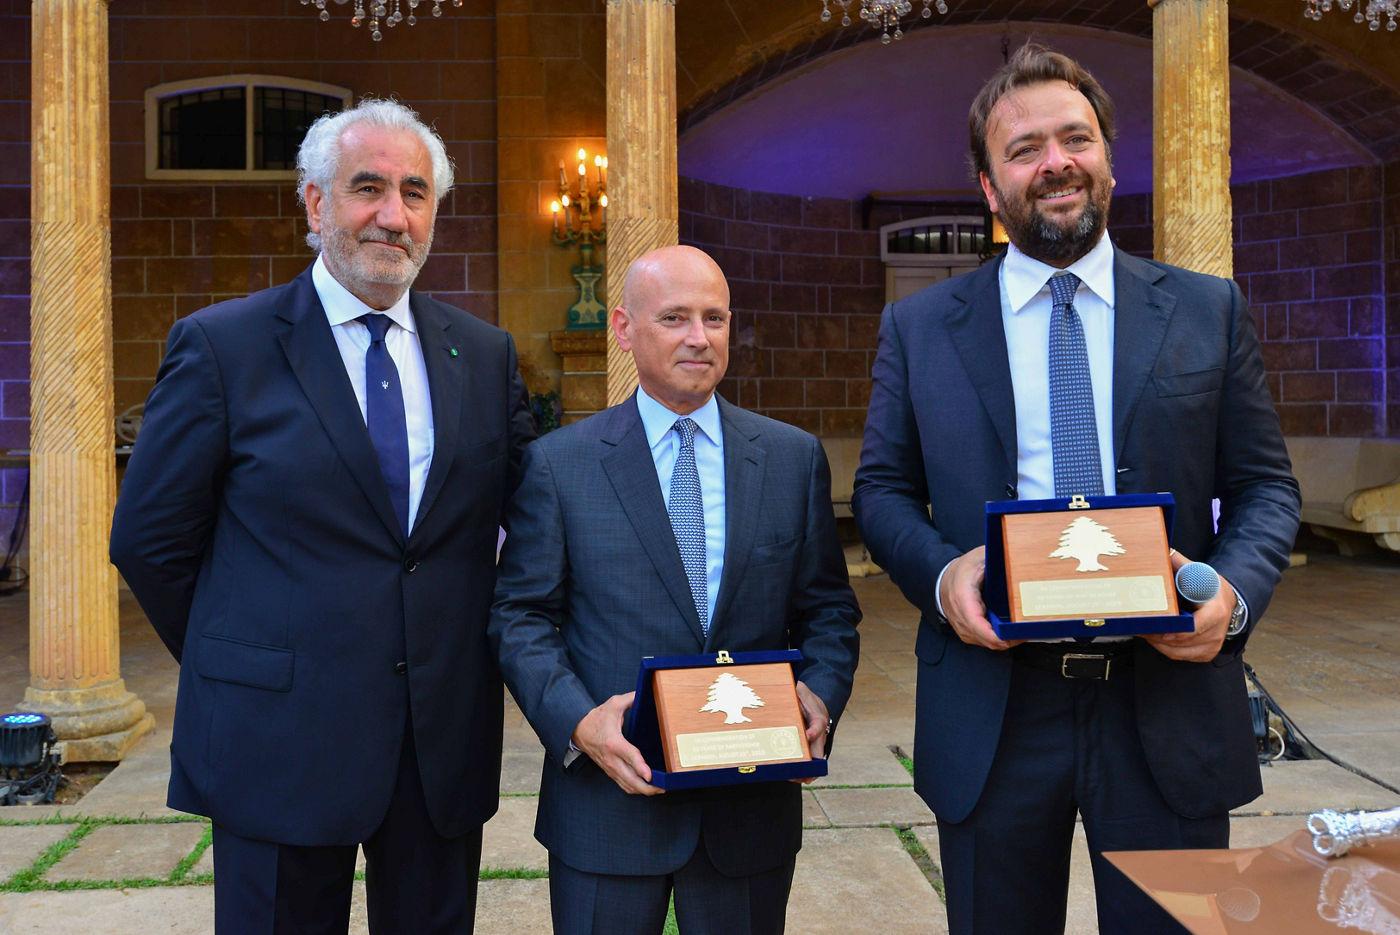 Nabil Bazerji, MD G.Bazerji & Fils , H.E Massimo Marotti, italienischer Botschafter im Libanon & Umberto Cini, General Manager Maserati EMEA